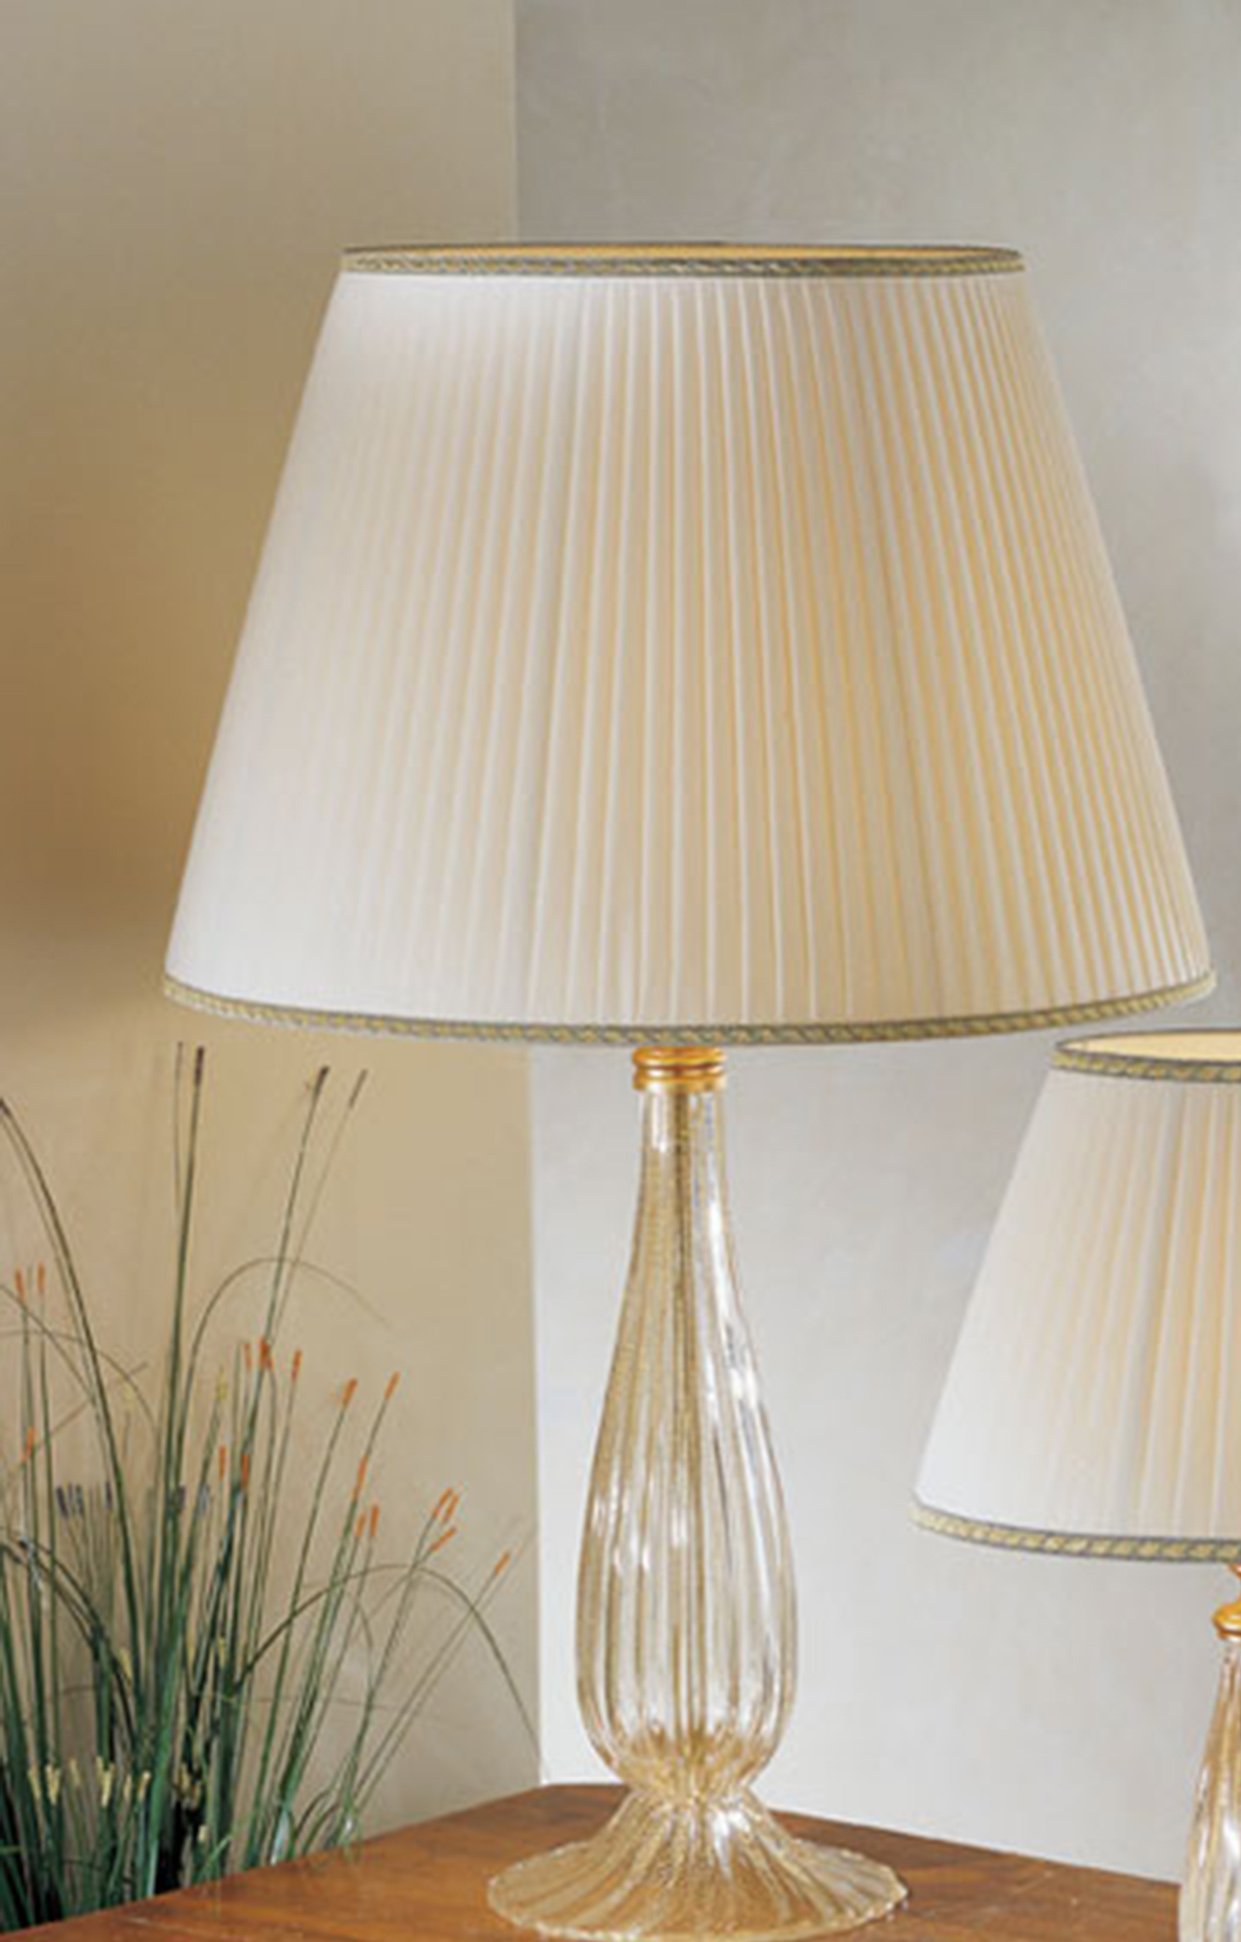 Duep lampada da tavolo 2325 lg 1 luce for Luce da tavolo